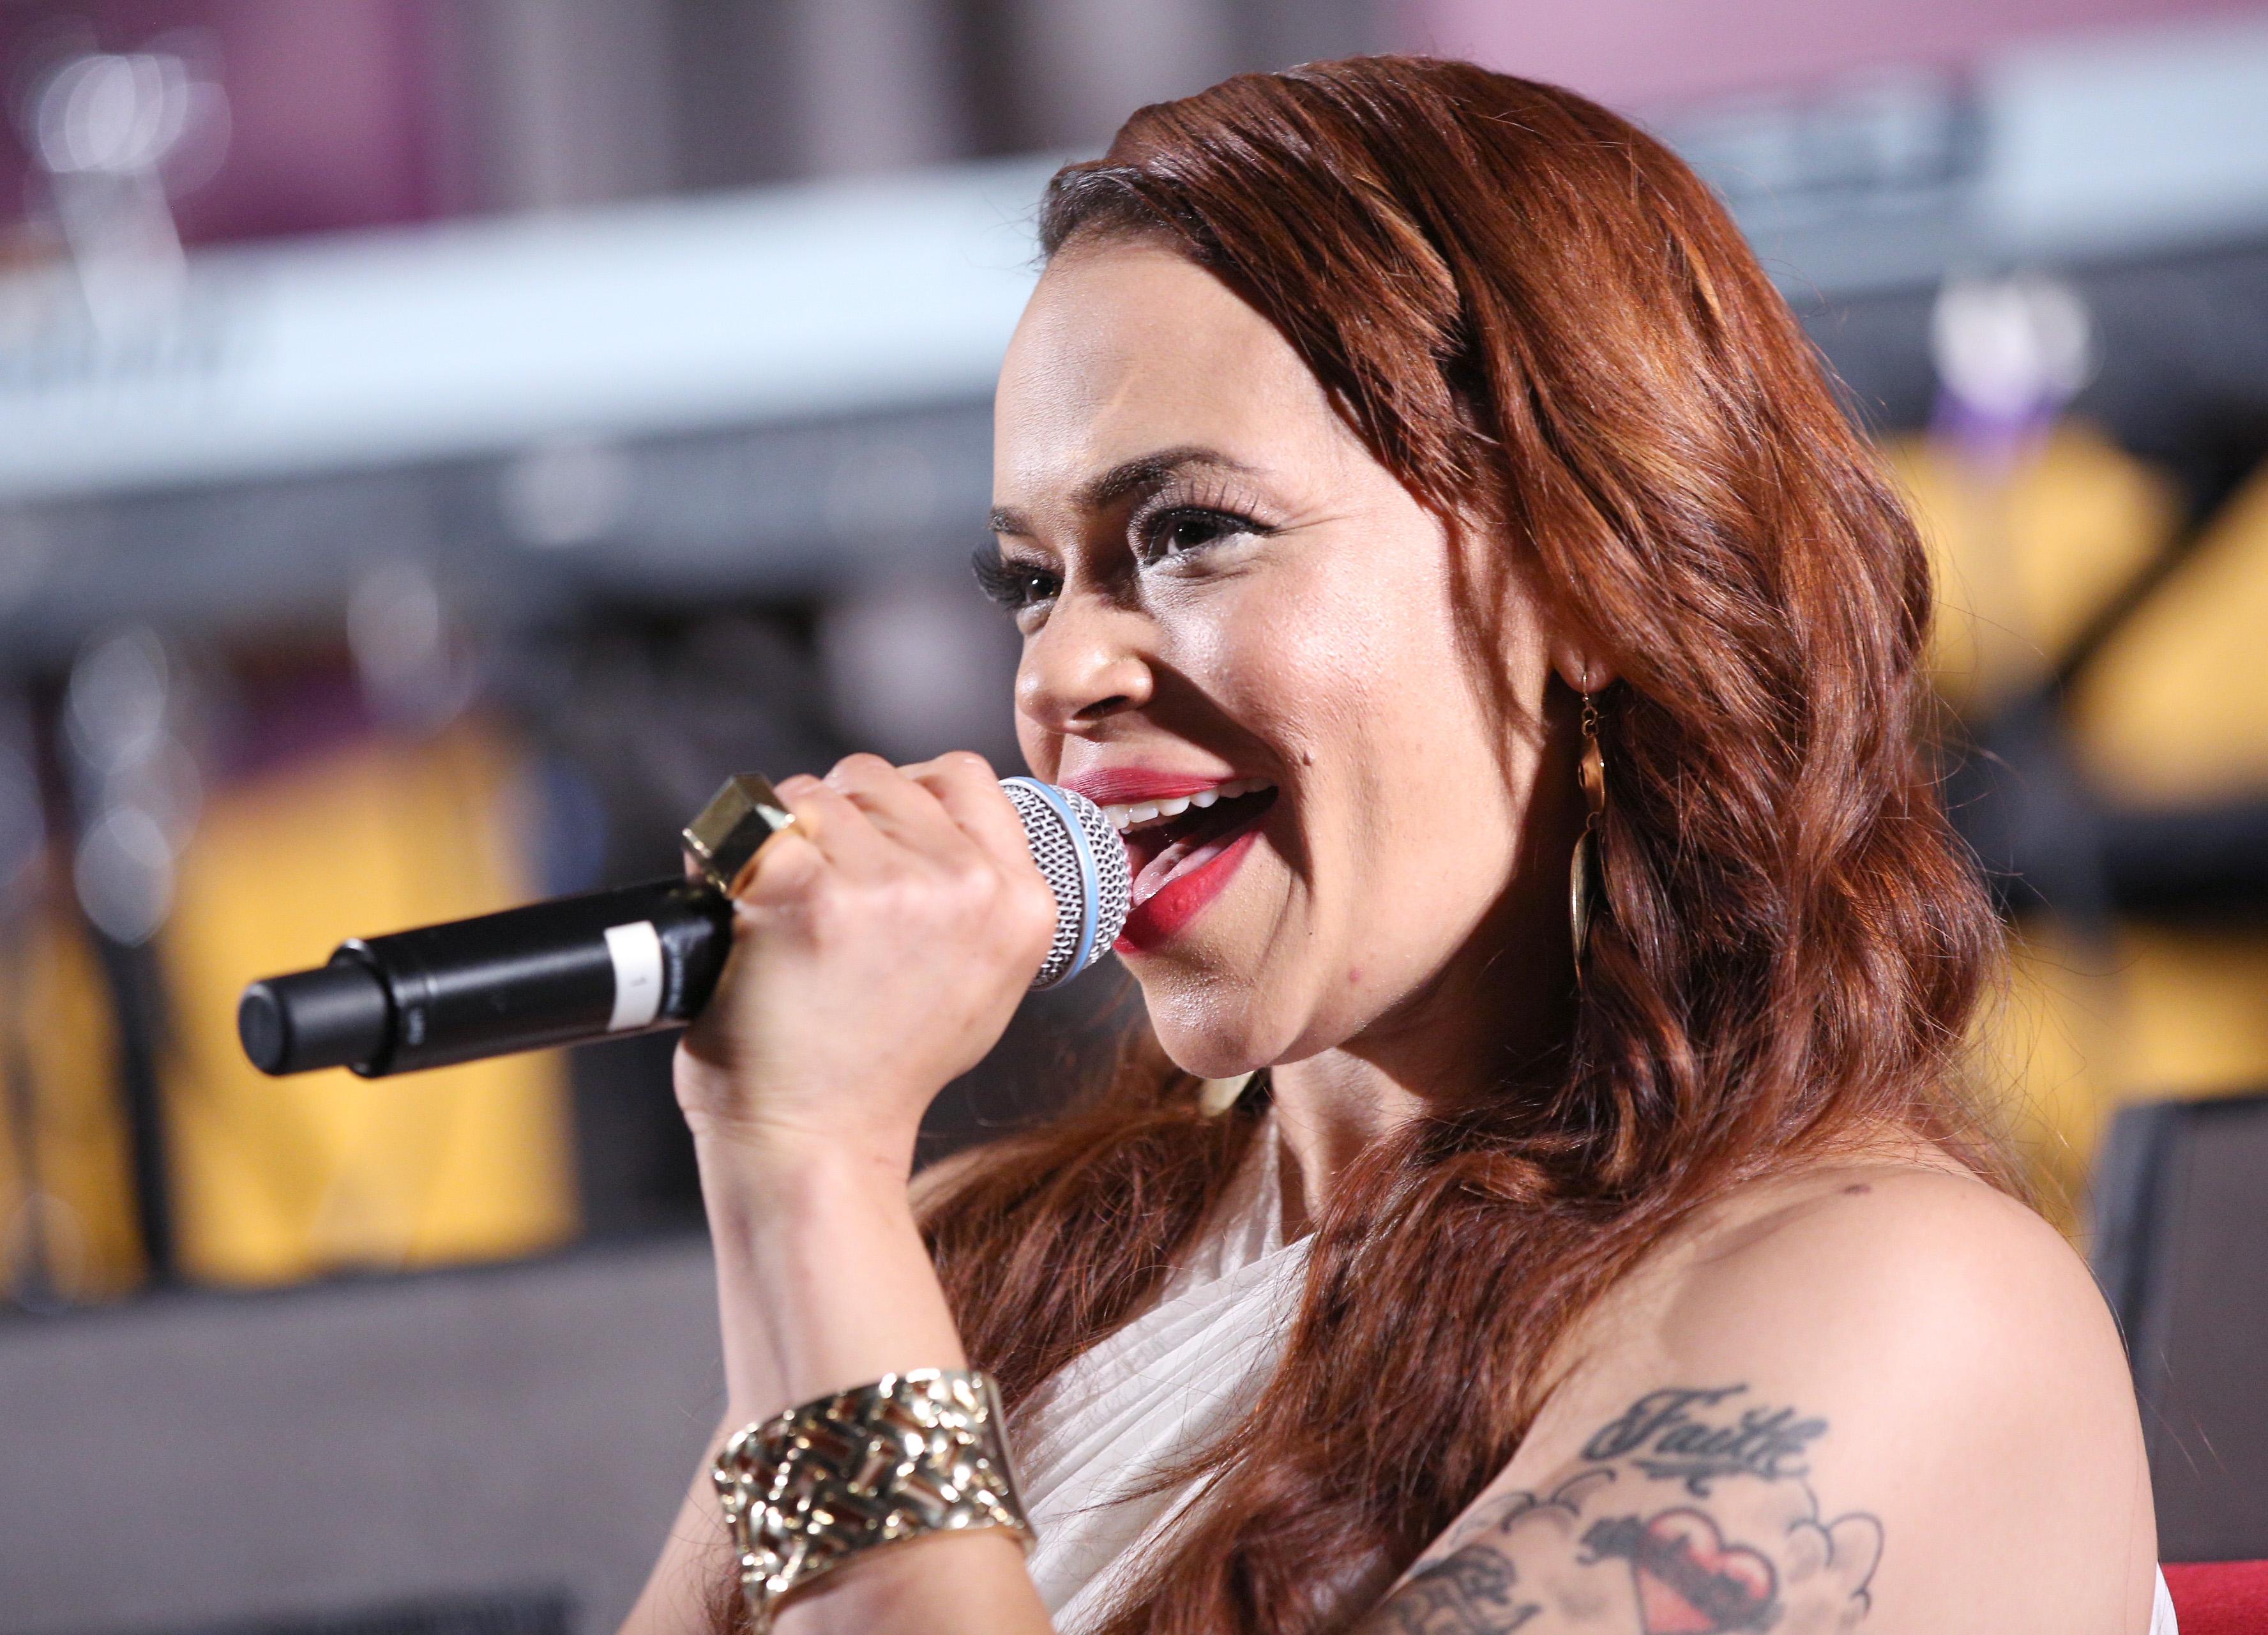 Faith evans biggie smalls new album 2014 one more chance singer